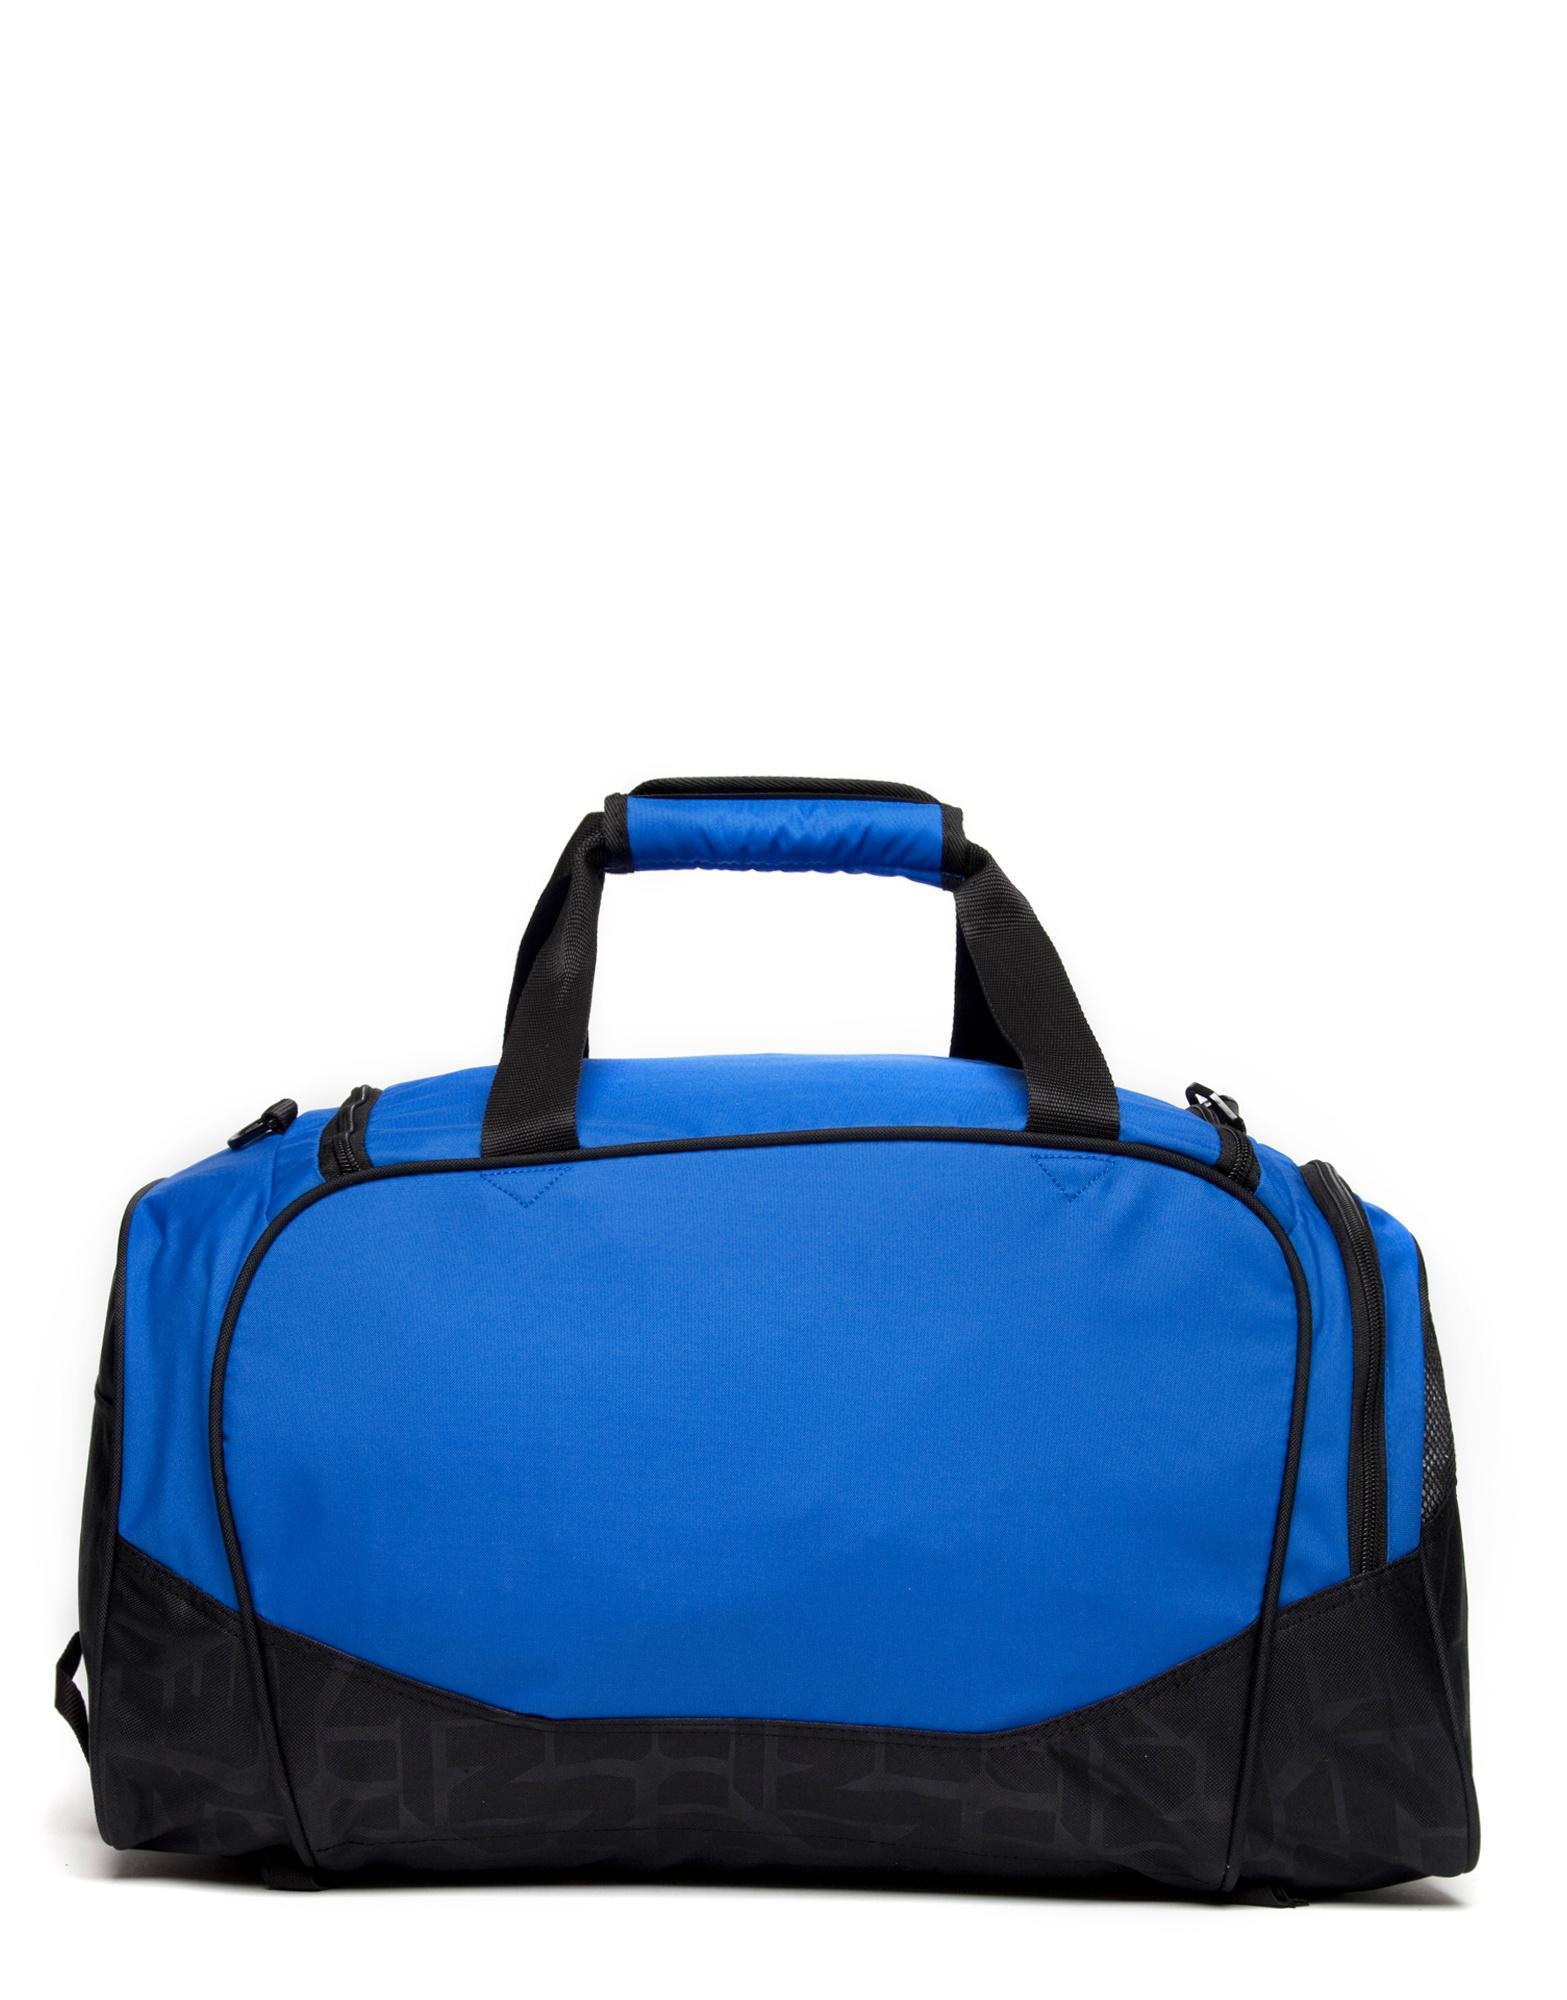 0a30b4ada Nike Brasilia Small Grip Bag in Blue for Men - Lyst